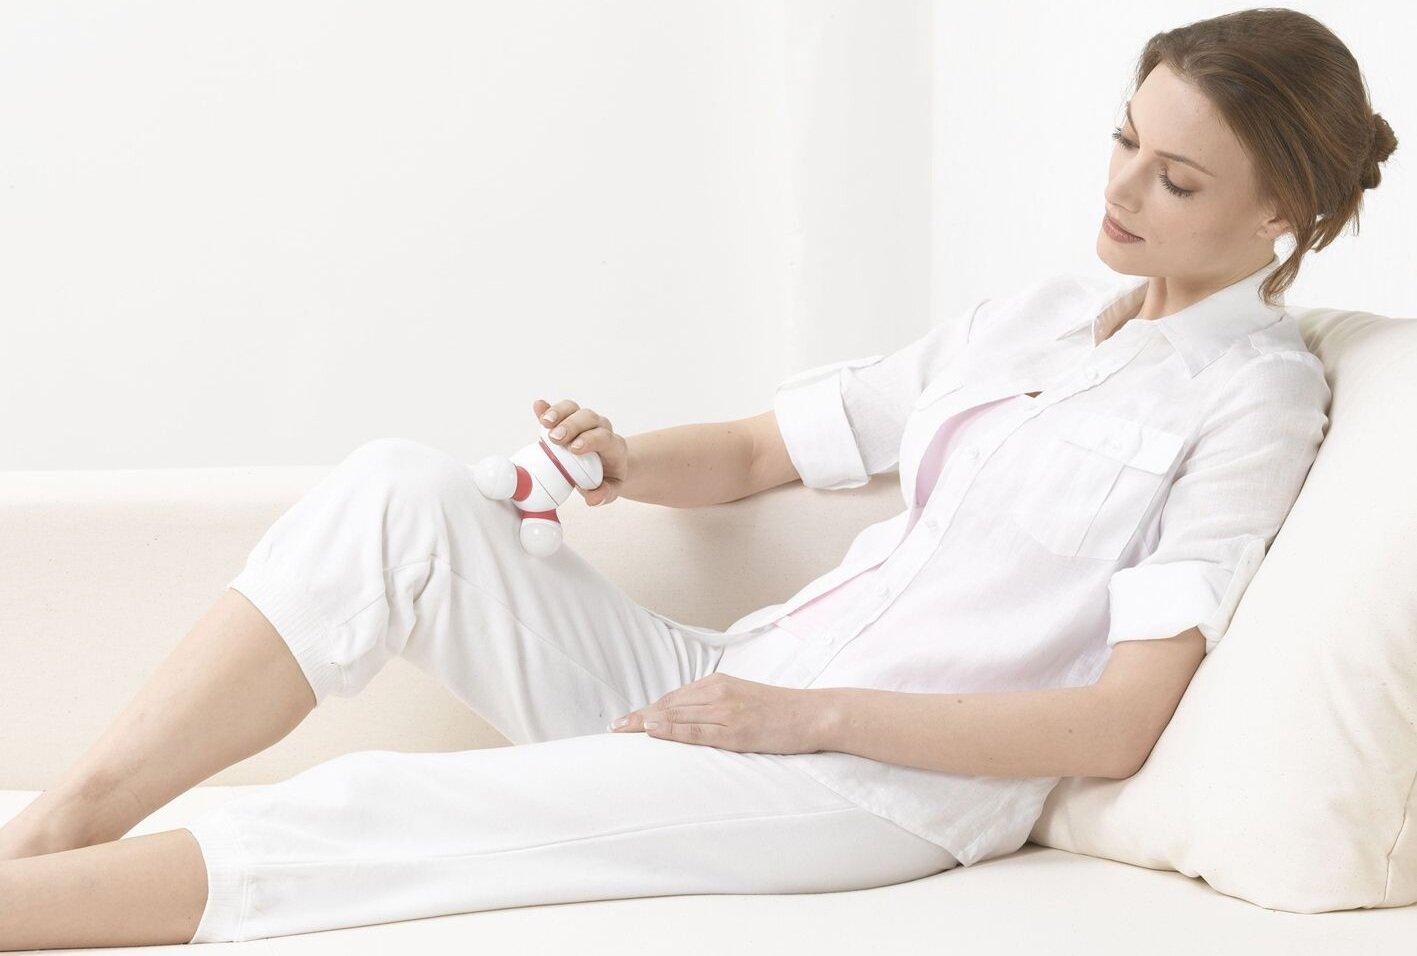 Máy massage Beurer MG510 To Go